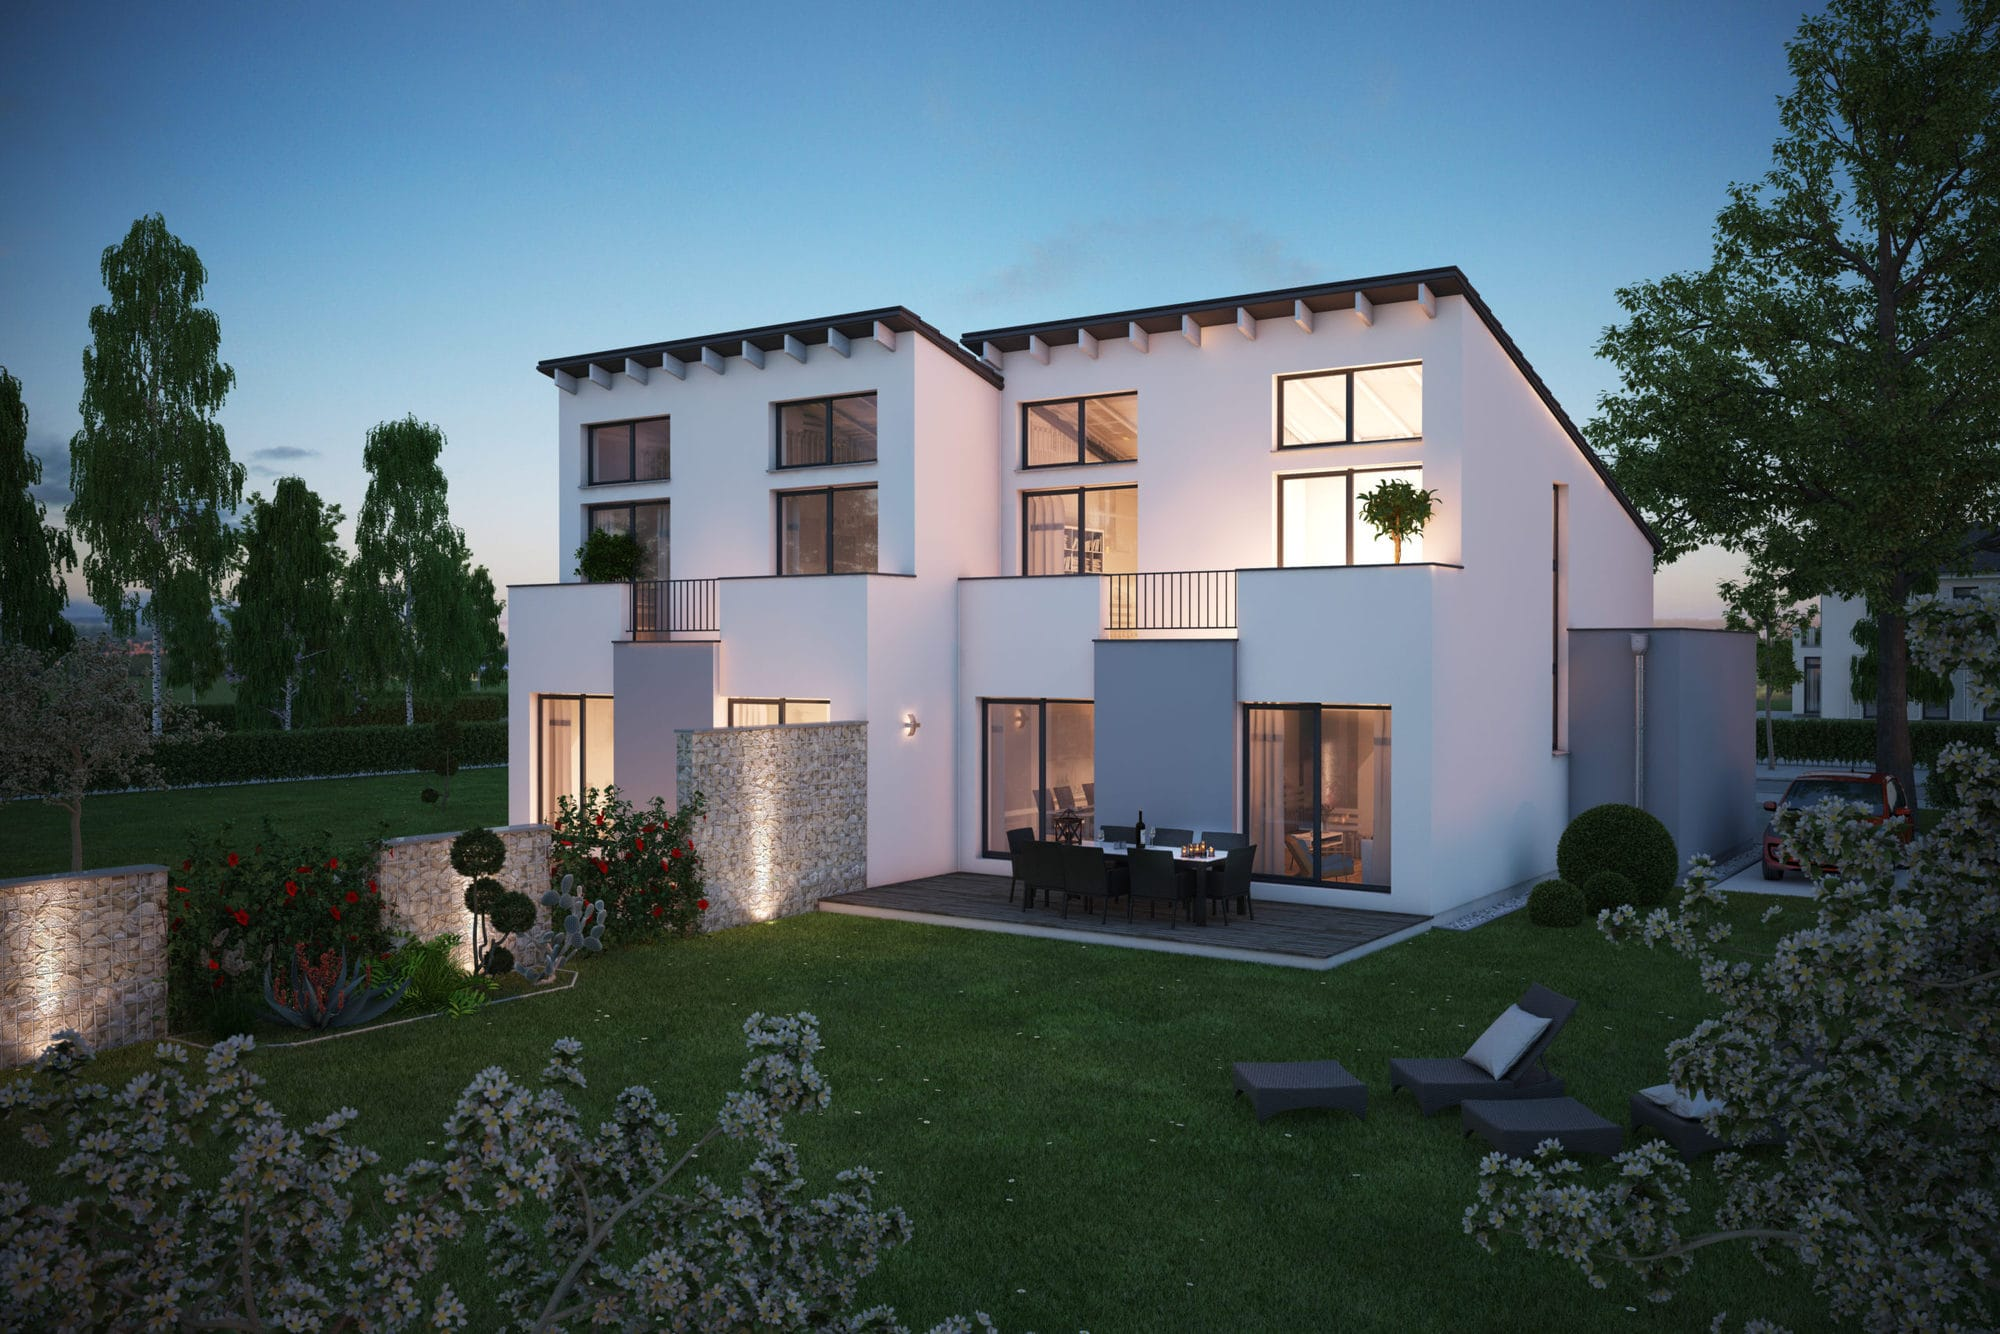 doppelhaus-pultdach-1